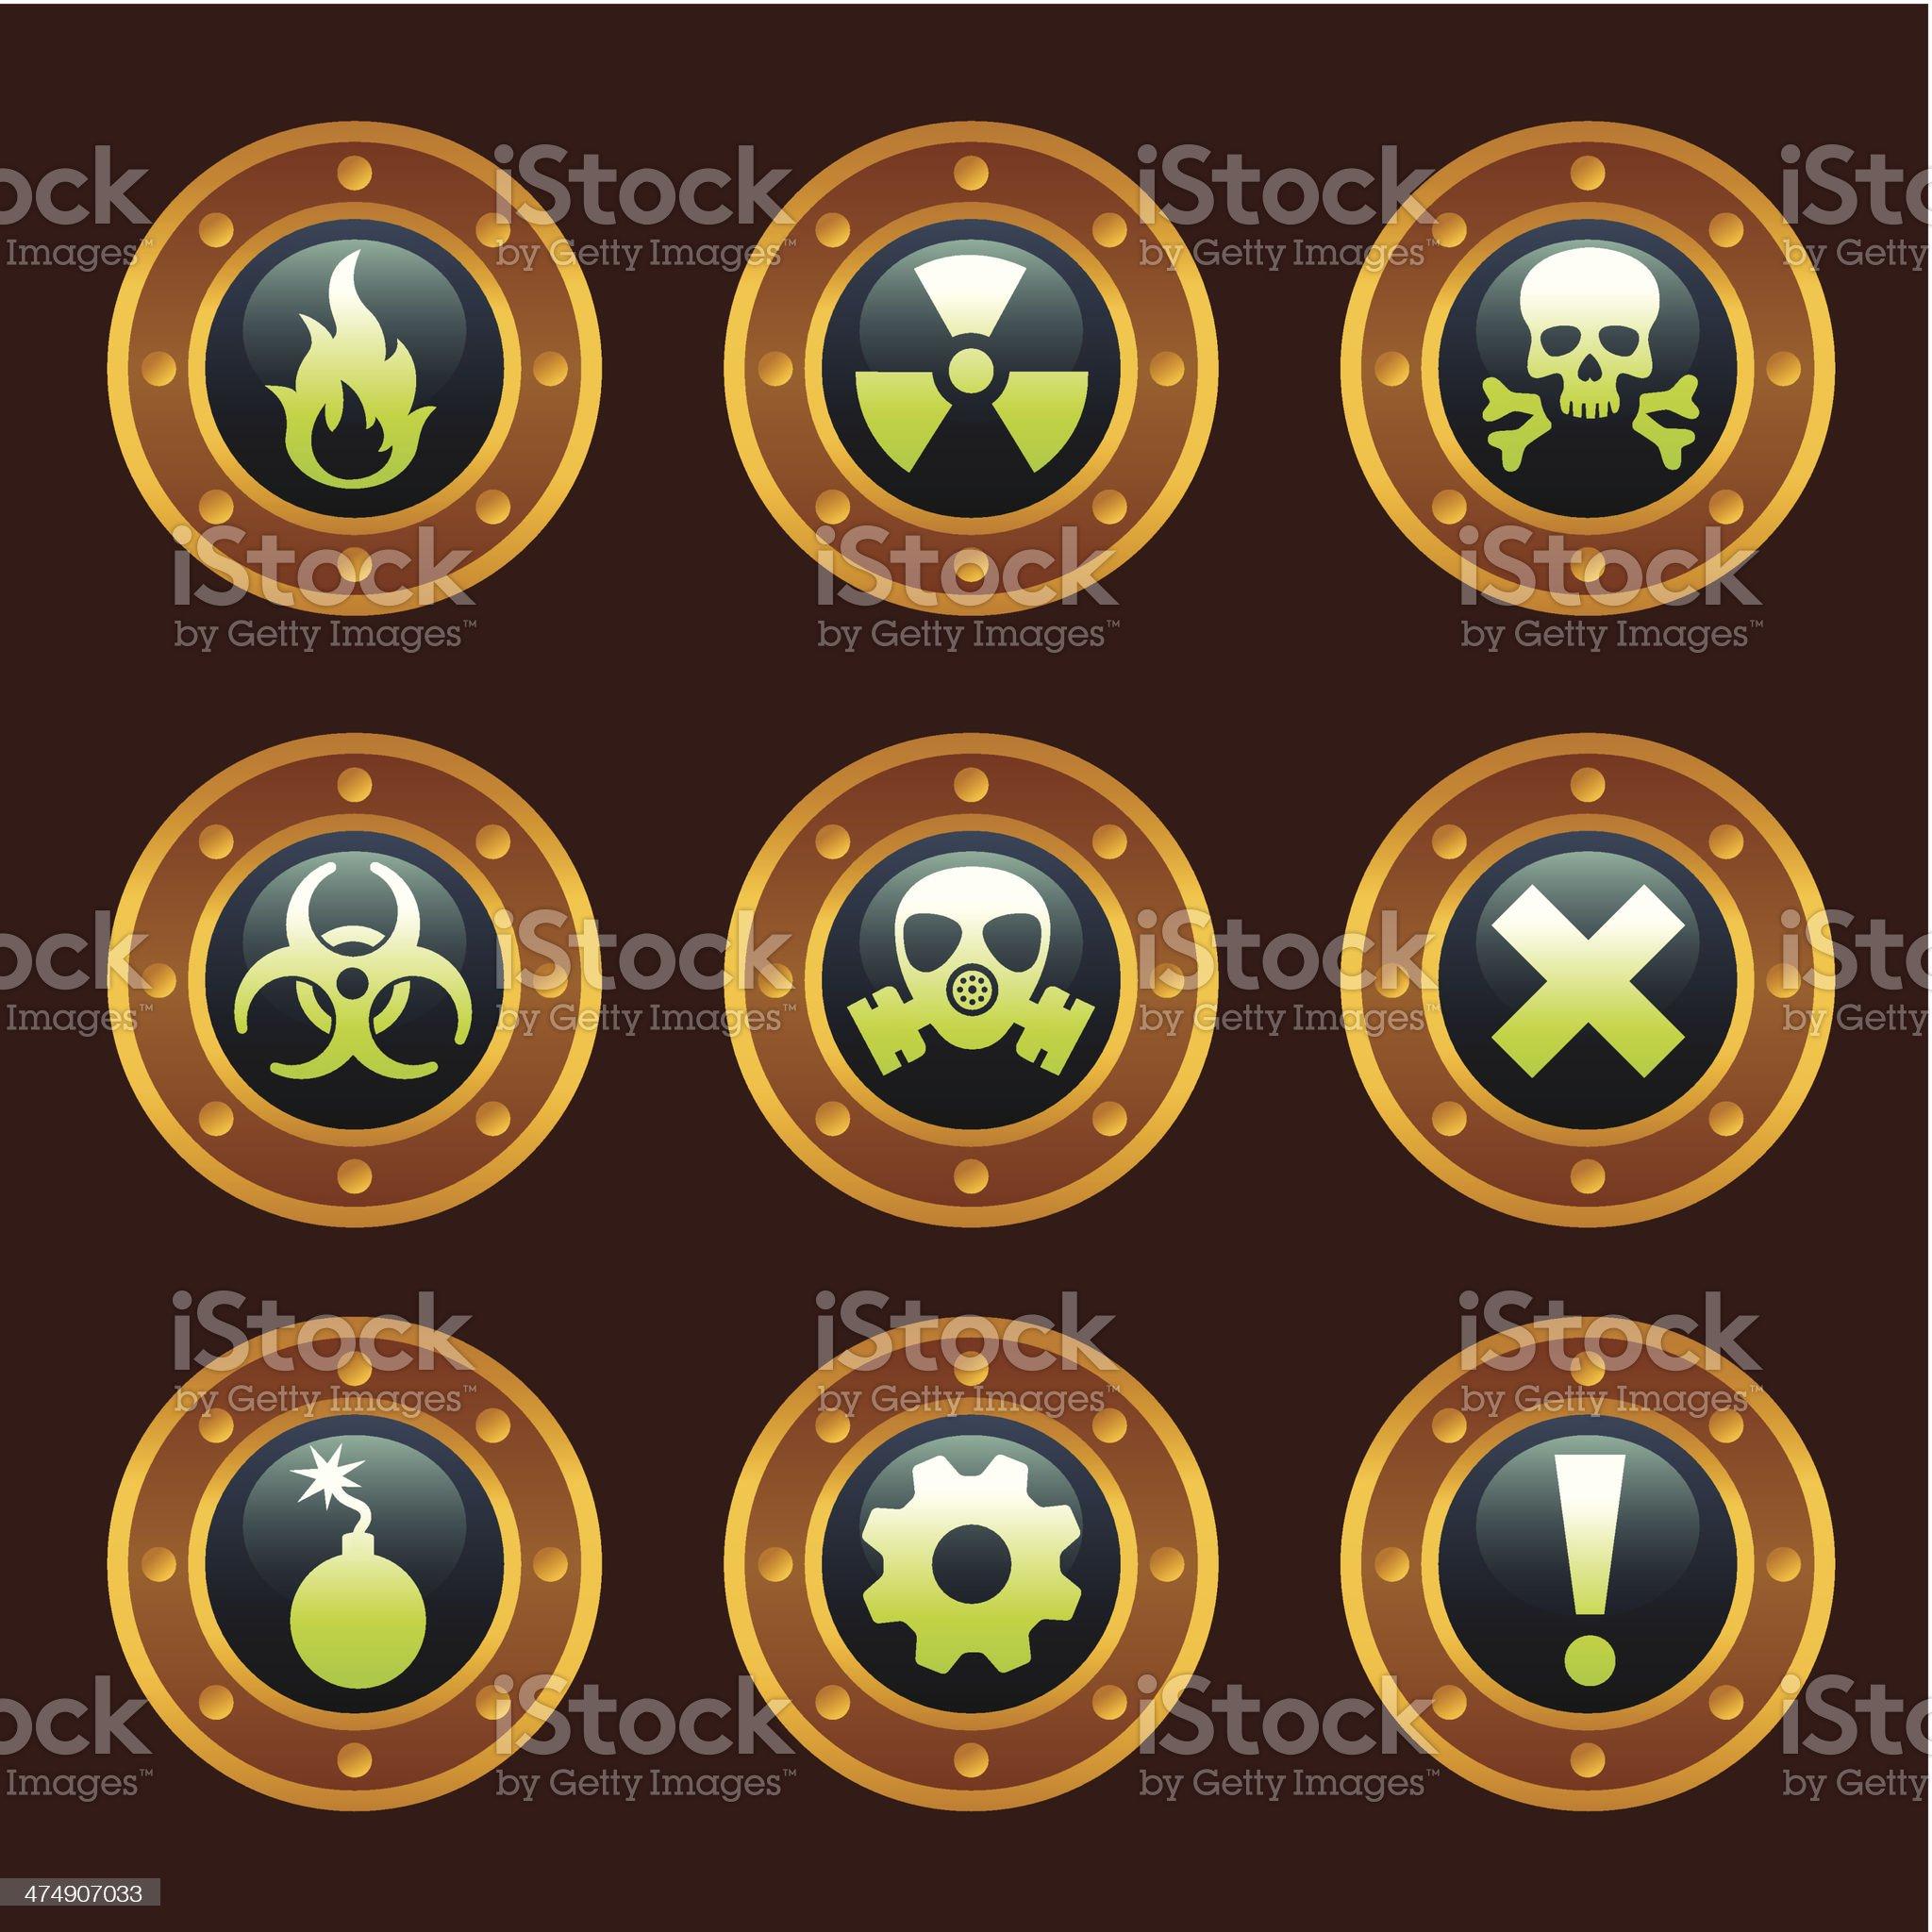 Steam punk danger signs royalty-free stock vector art